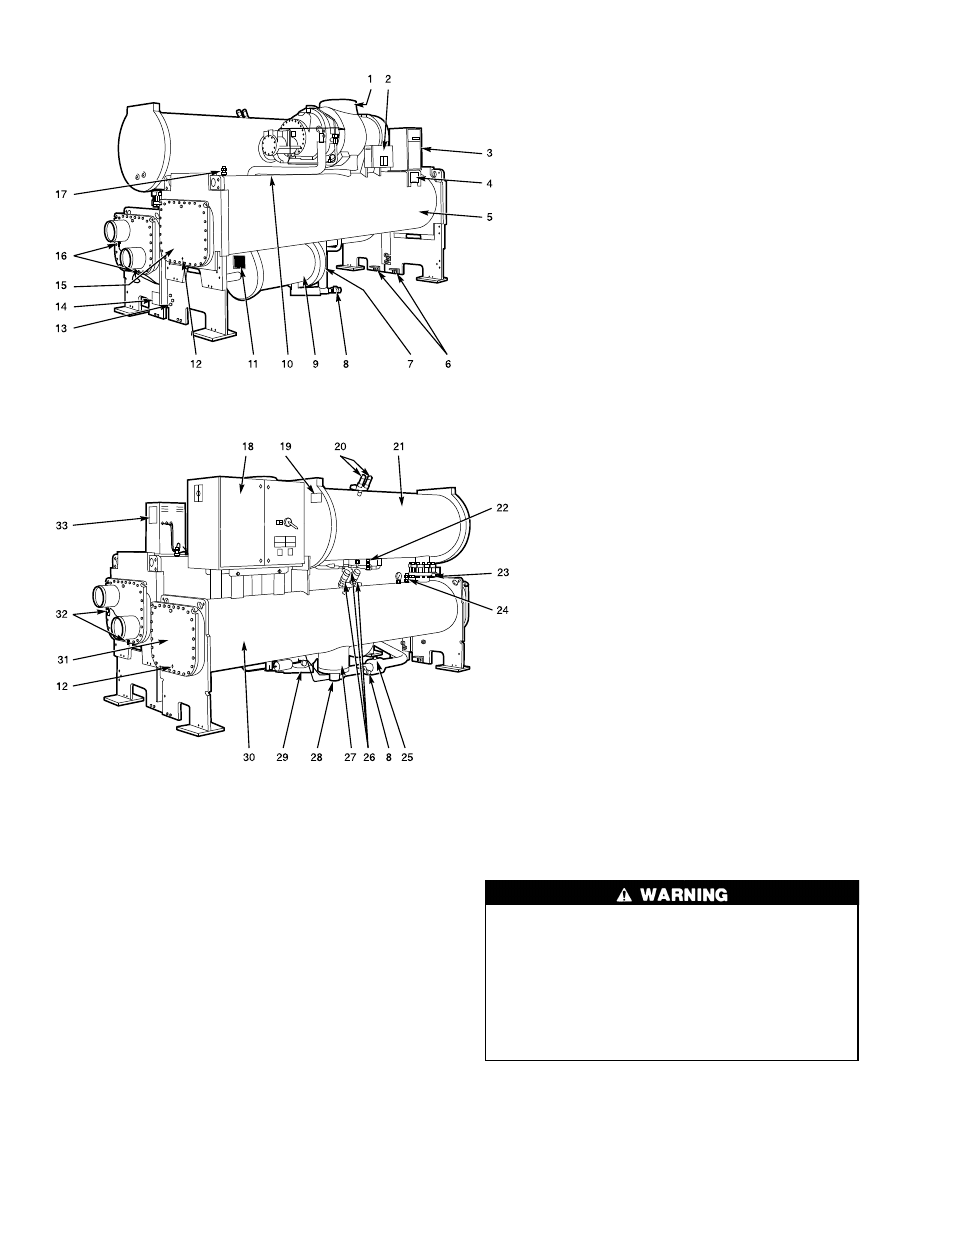 2002 hyundai sonata fuse panel